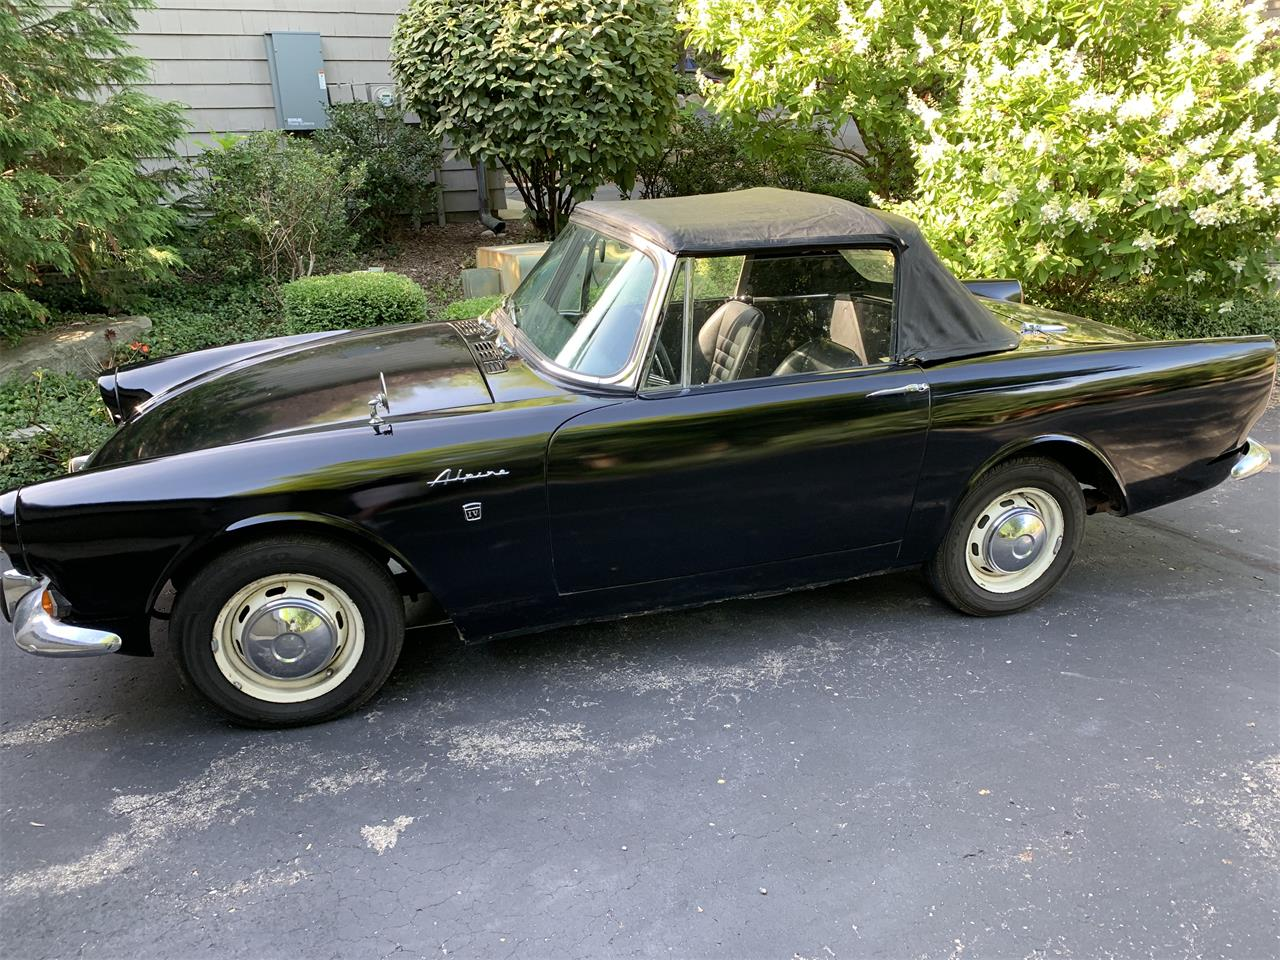 1965 Sunbeam Alpine IV (CC-1254197) for sale in Bloomfield Hills, Michigan